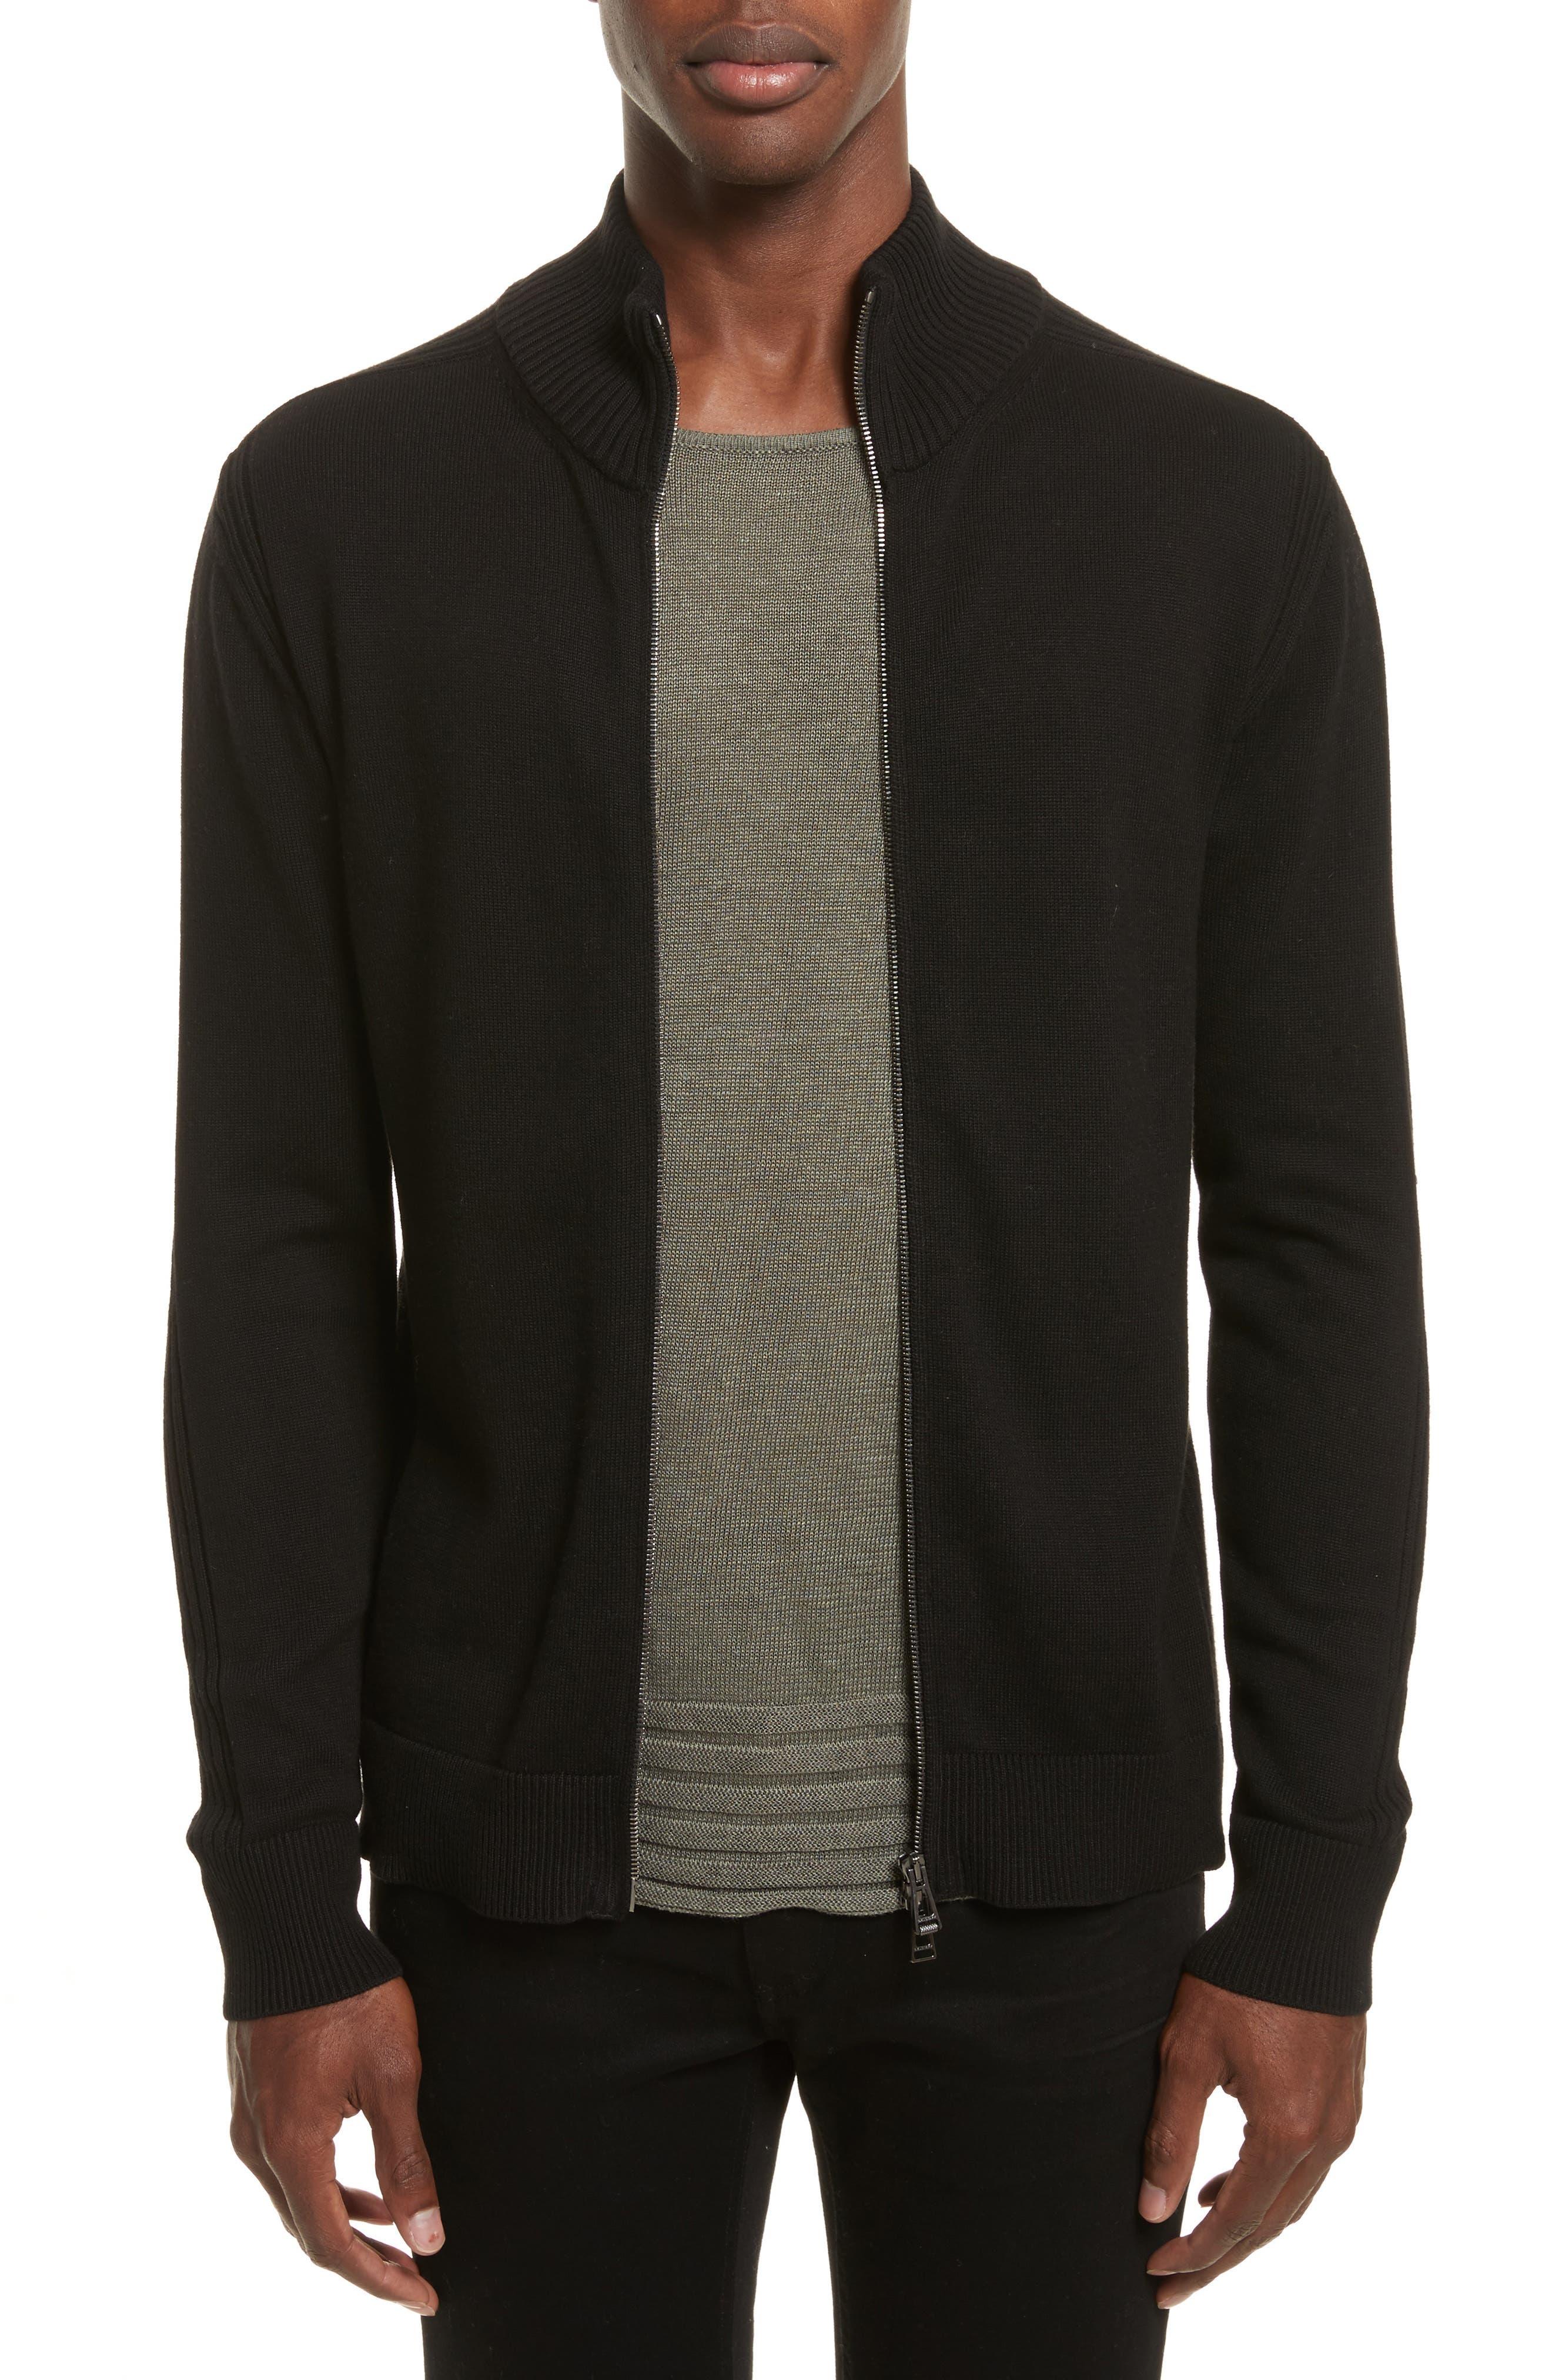 Allerford Knit Cotton Jacket,                             Main thumbnail 1, color,                             Black